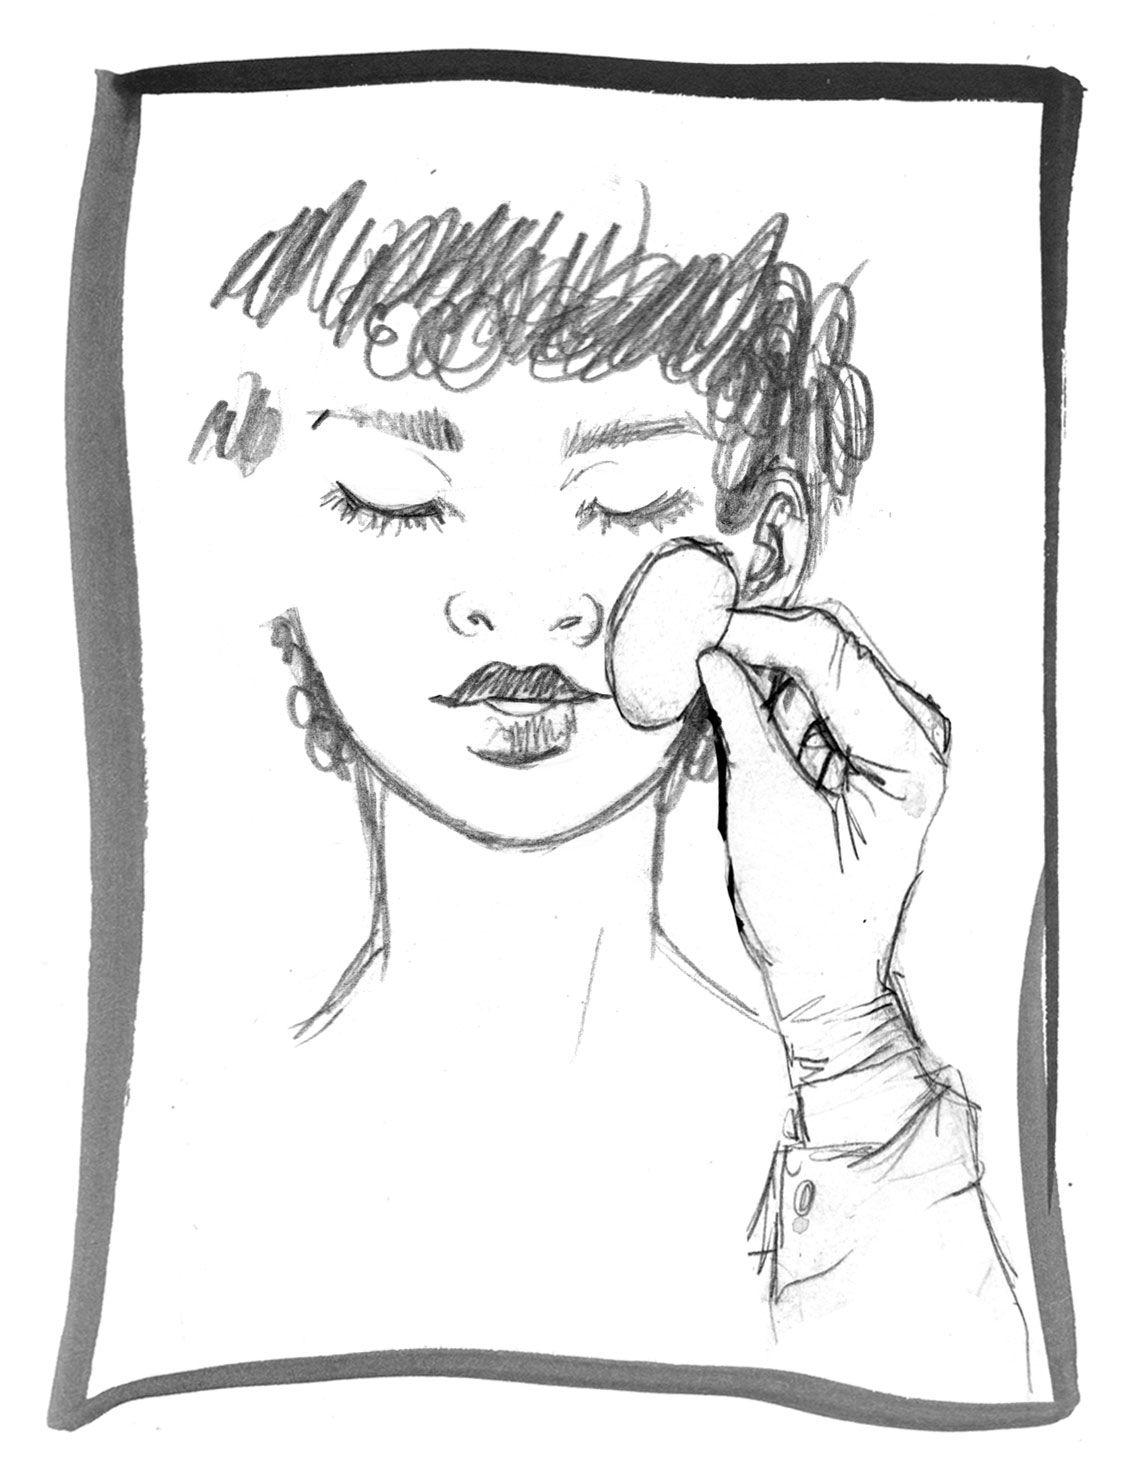 Step 1, illustrated